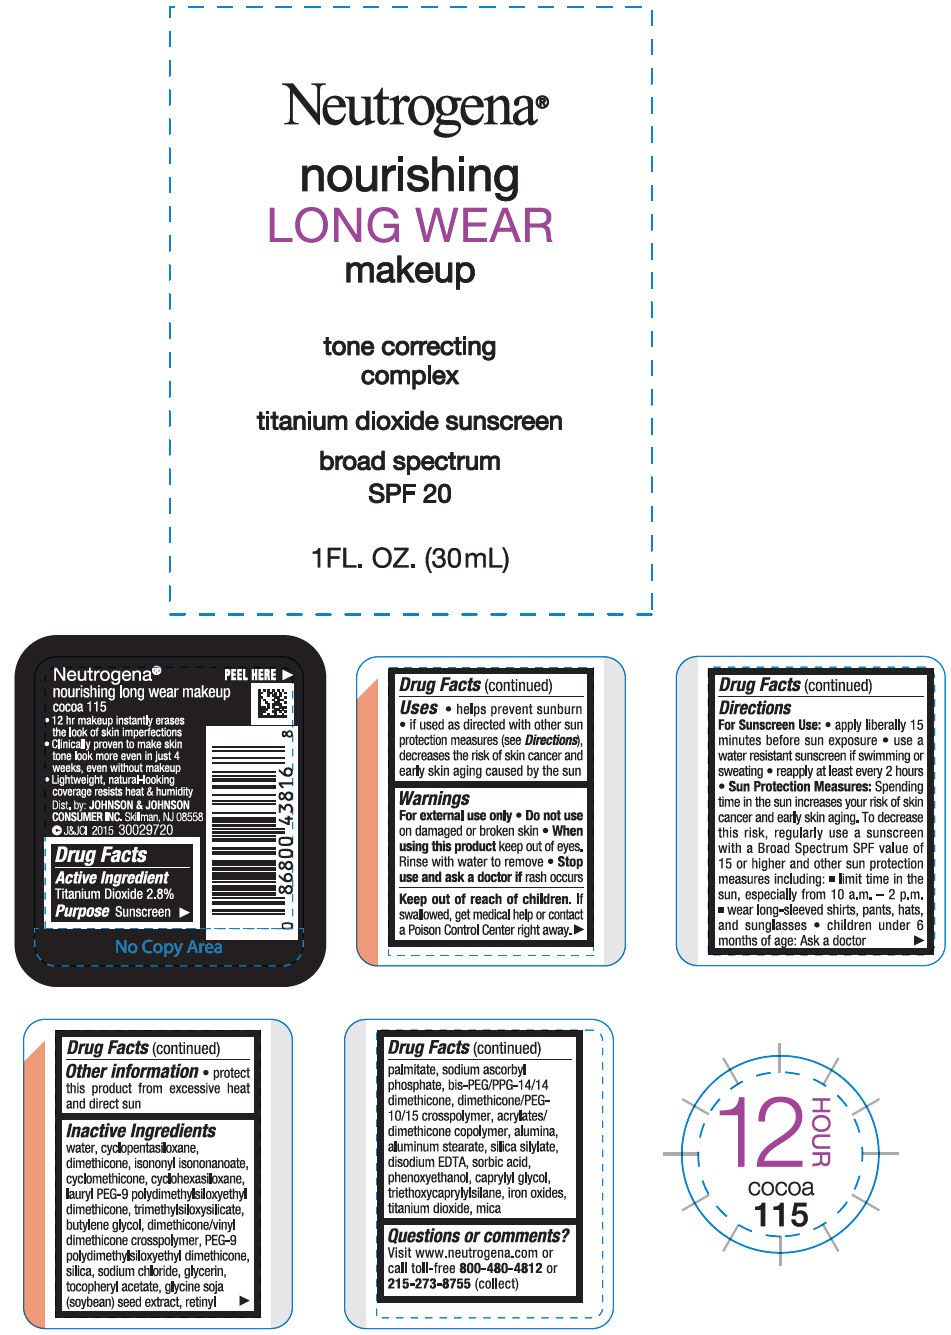 Titanium Dioxide (Neutrogena nourishing LONG WEAR makeup sunscreen broad spectrum SPF 20 cocoa 115)